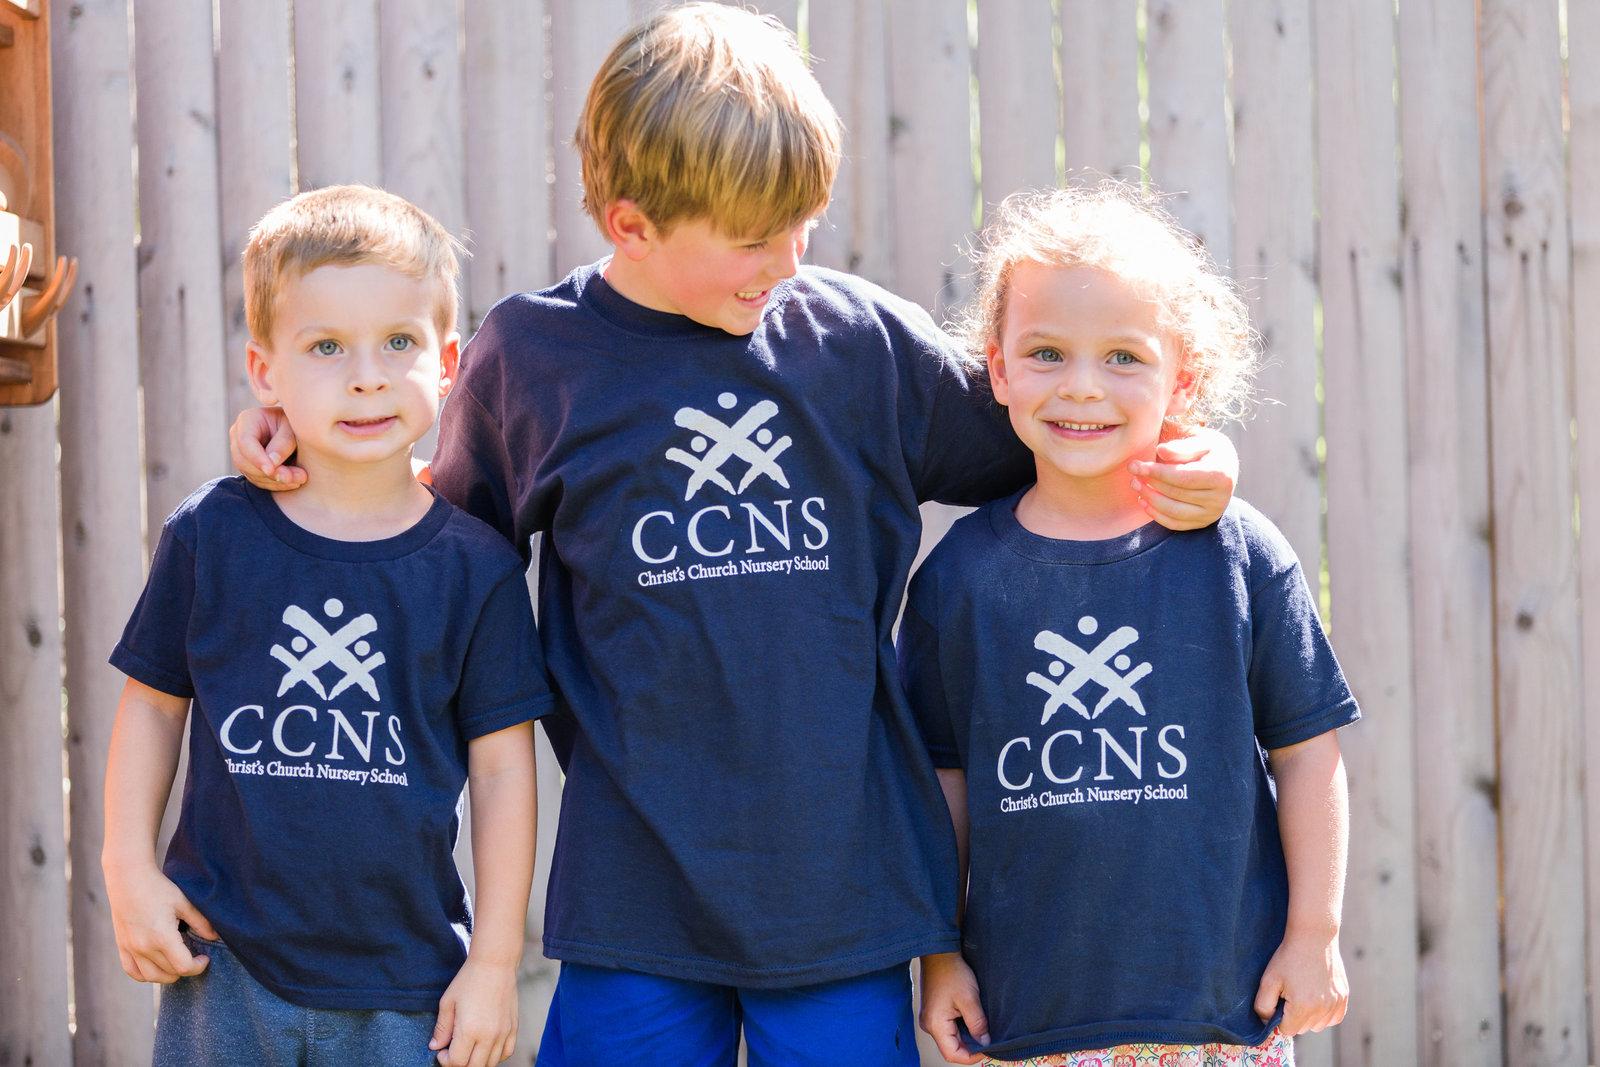 rye-nursery-school-ccns-9